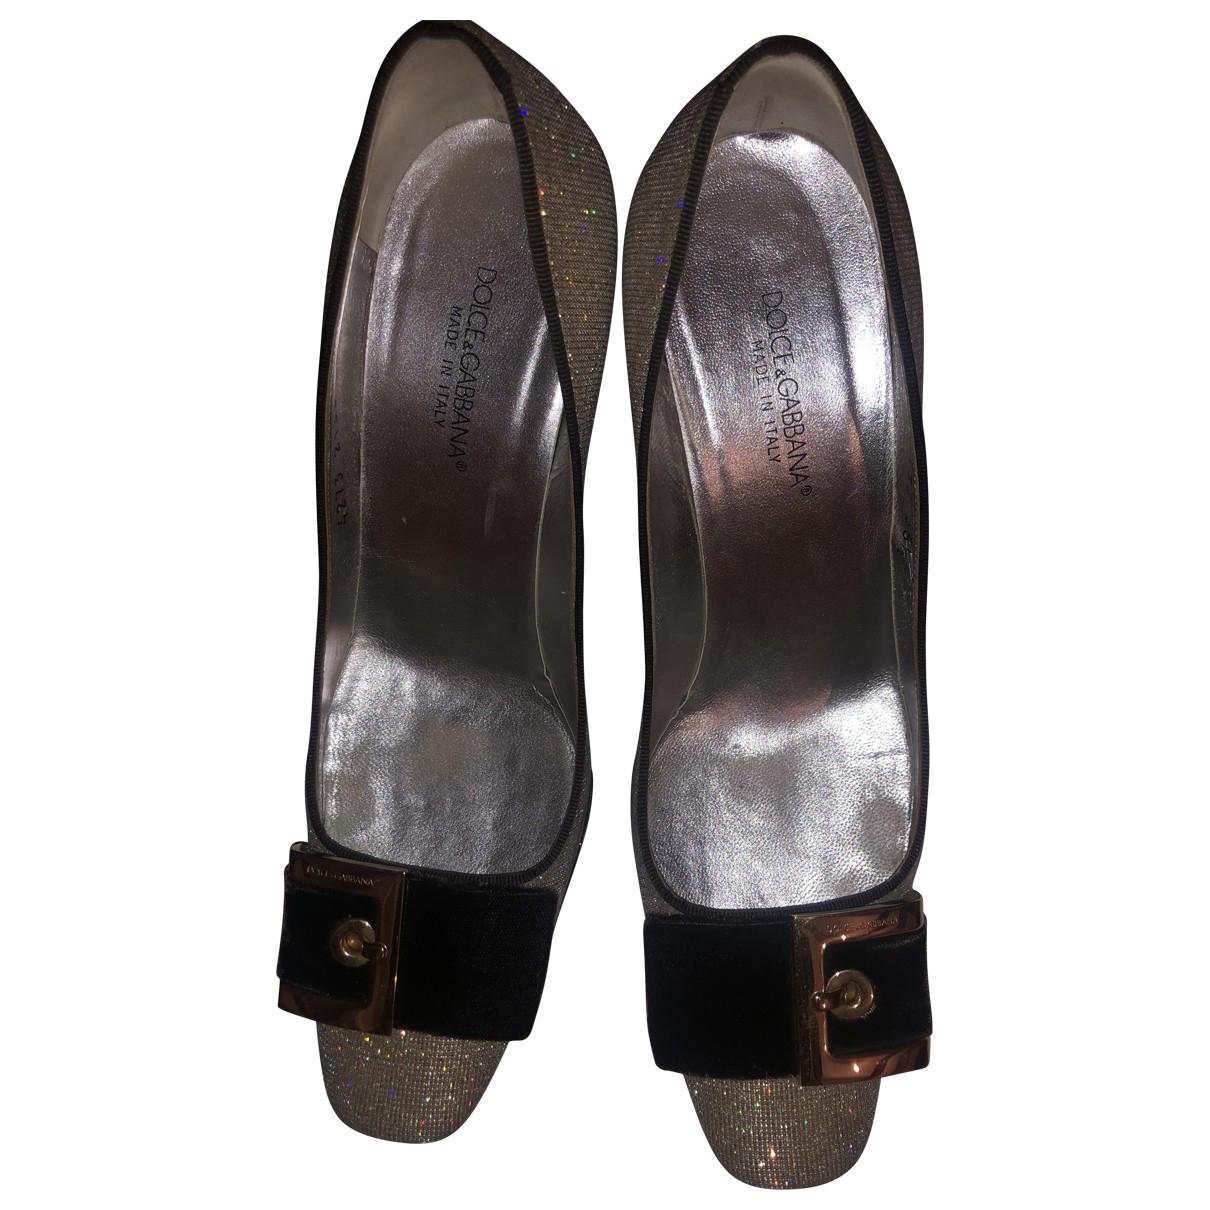 Dolce & Gabbana N Silver Cloth Heels for Women 36.5 EU